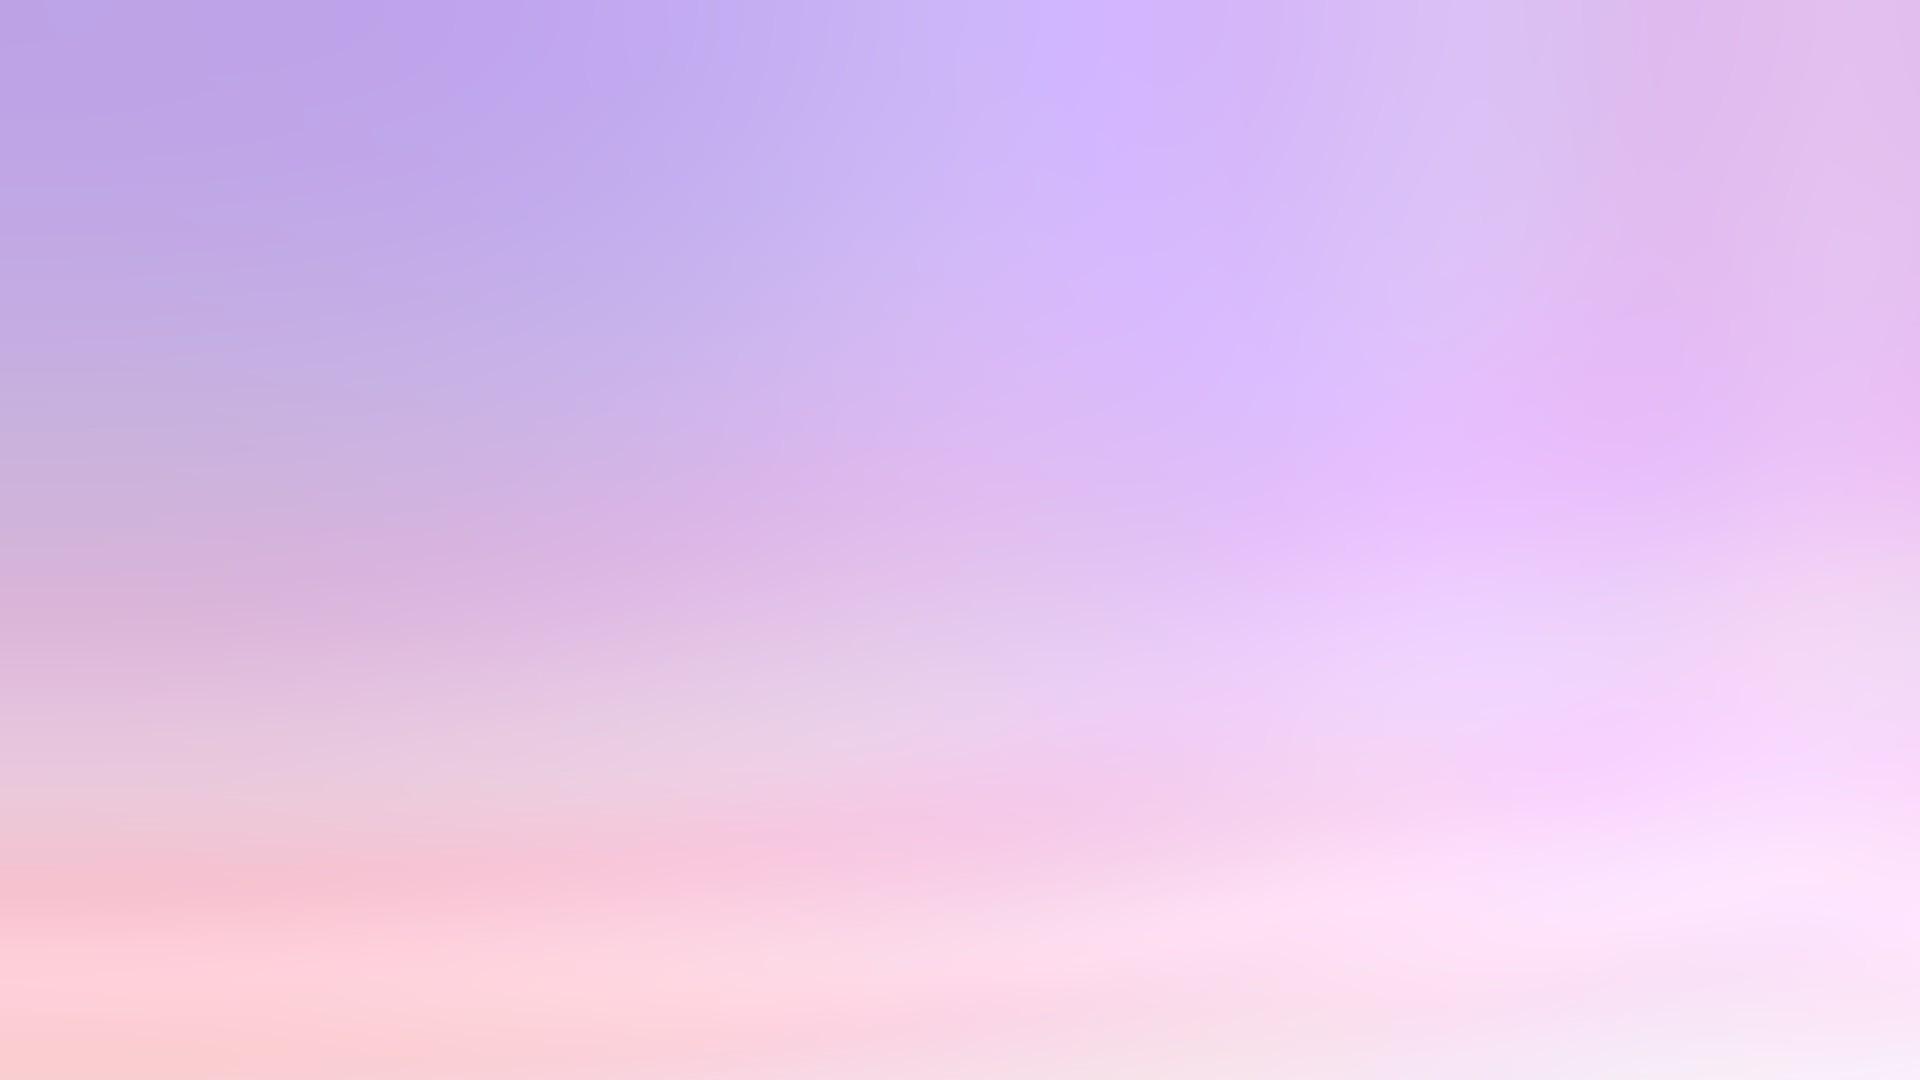 Pink Gradient Tumblr